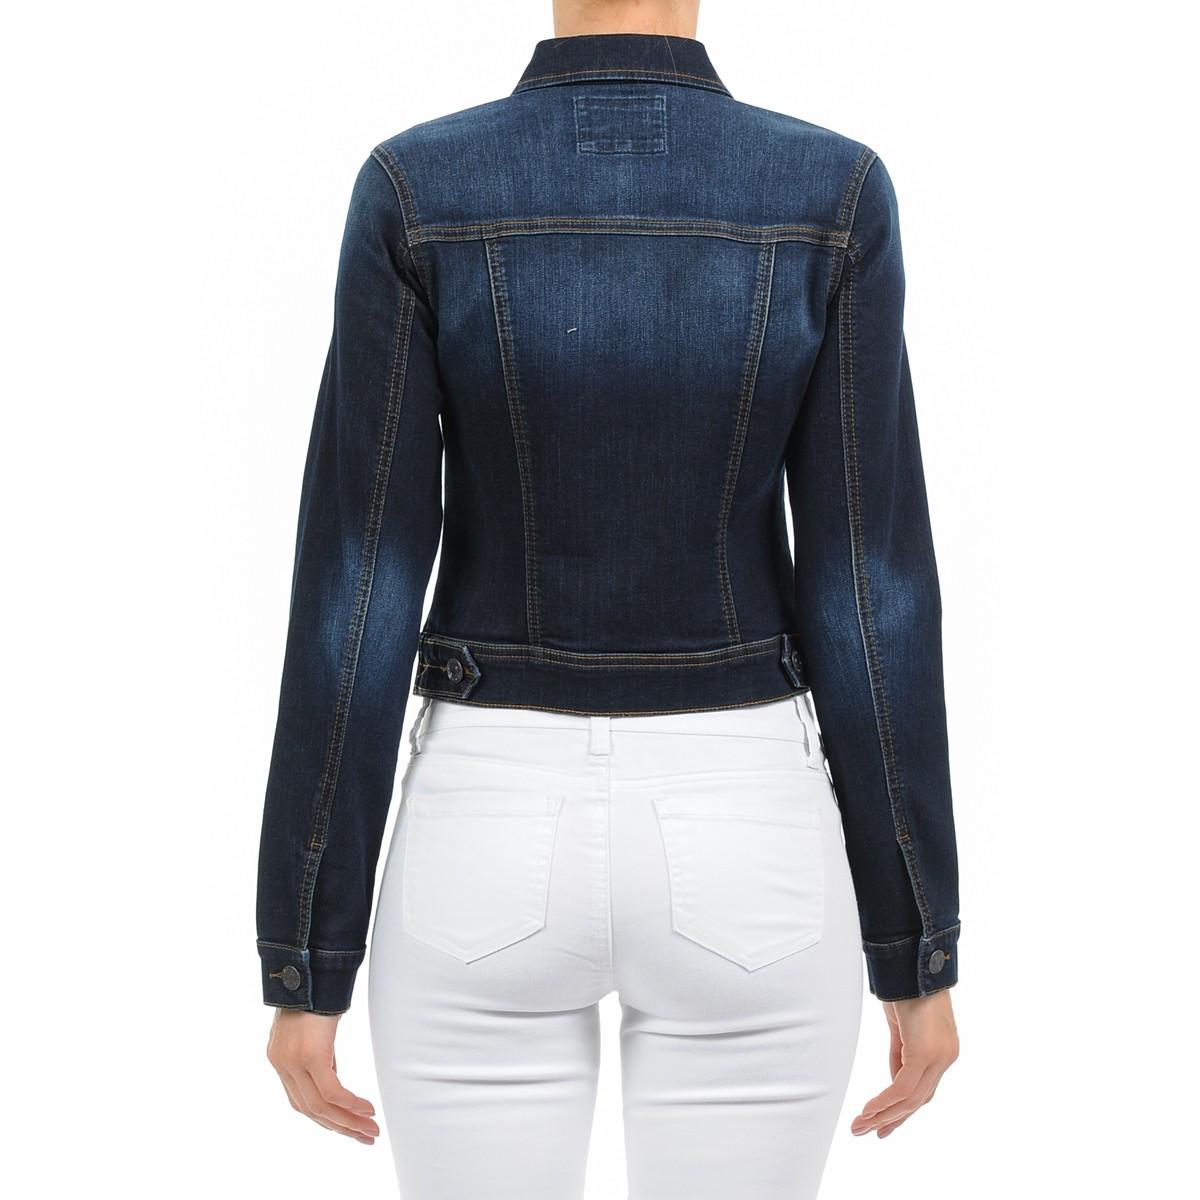 Women-039-s-Plus-Size-Cropped-Denim-Jackets-Long-Sleeve-Jean-Coats thumbnail 6